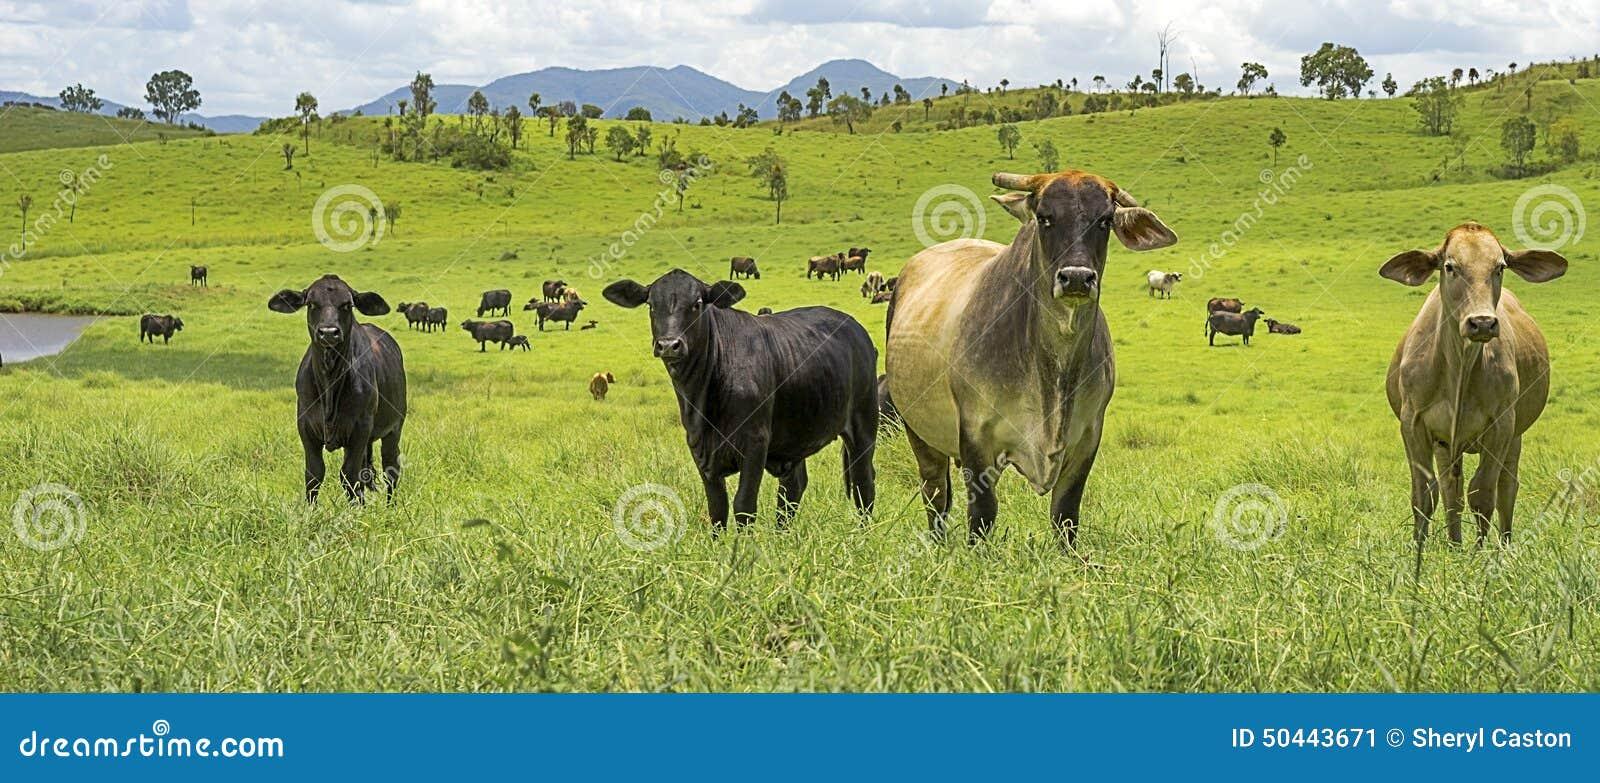 Nice Cattle Manager Resume Illustration - Administrative Officer ...